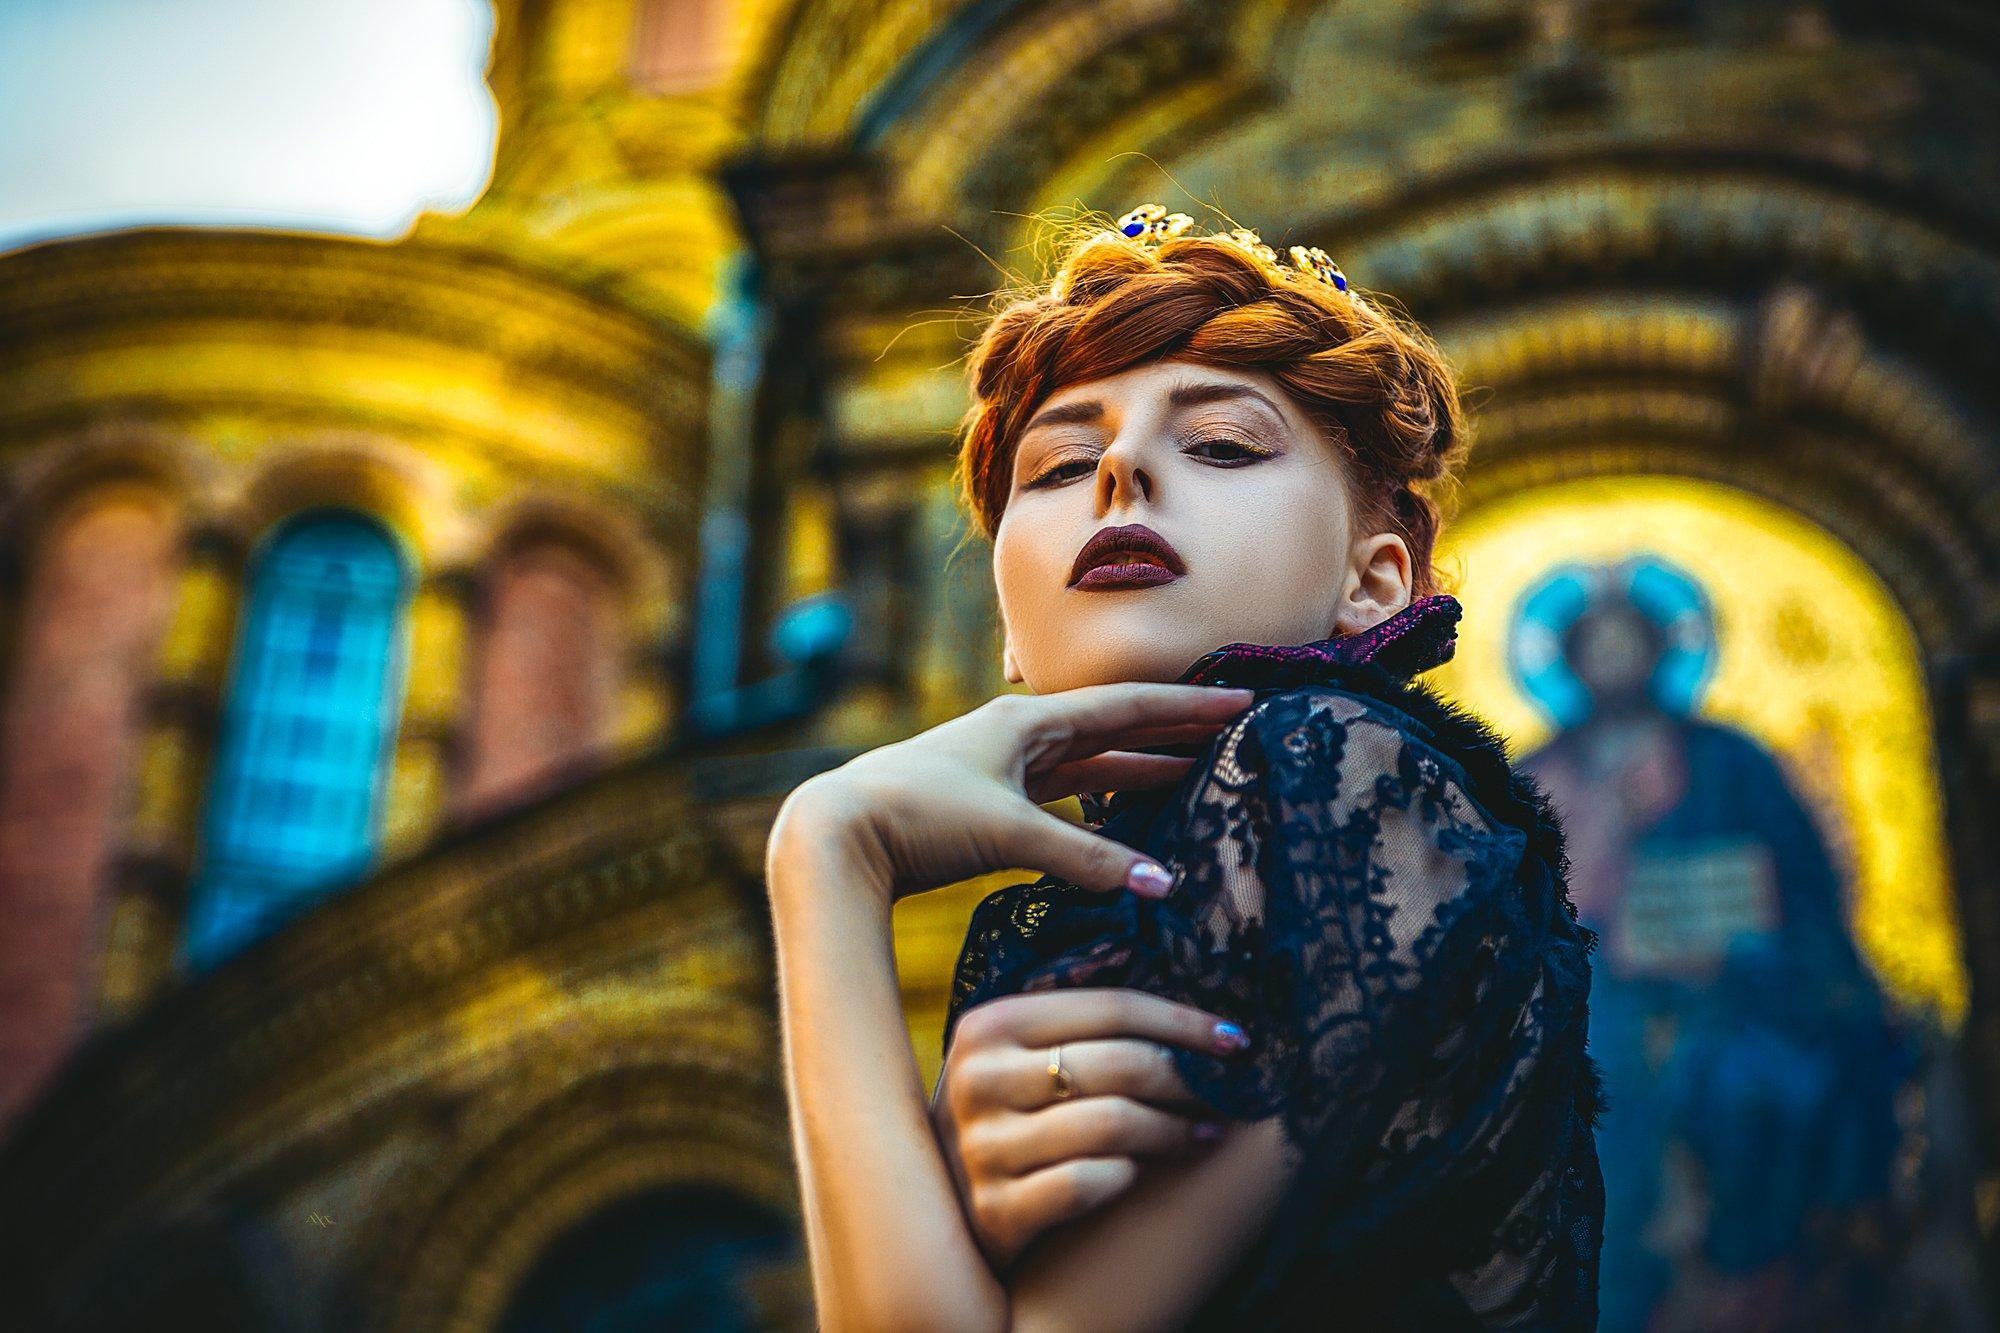 woman, fashion, art, church, portrait, natural light, Руслан Болгов (Axe)